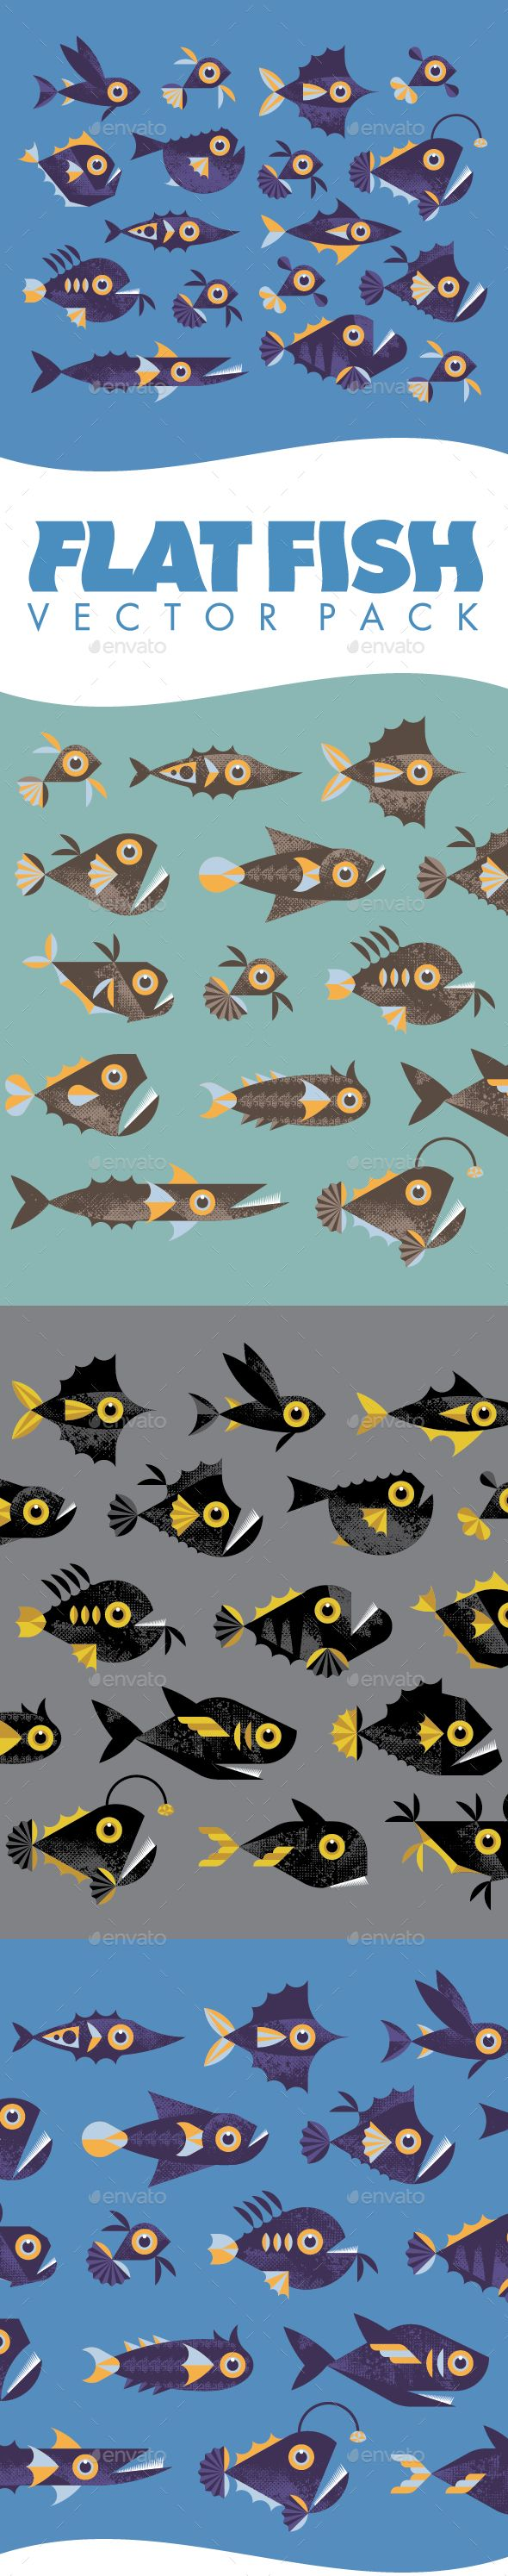 Flat Fish - Vector Pack